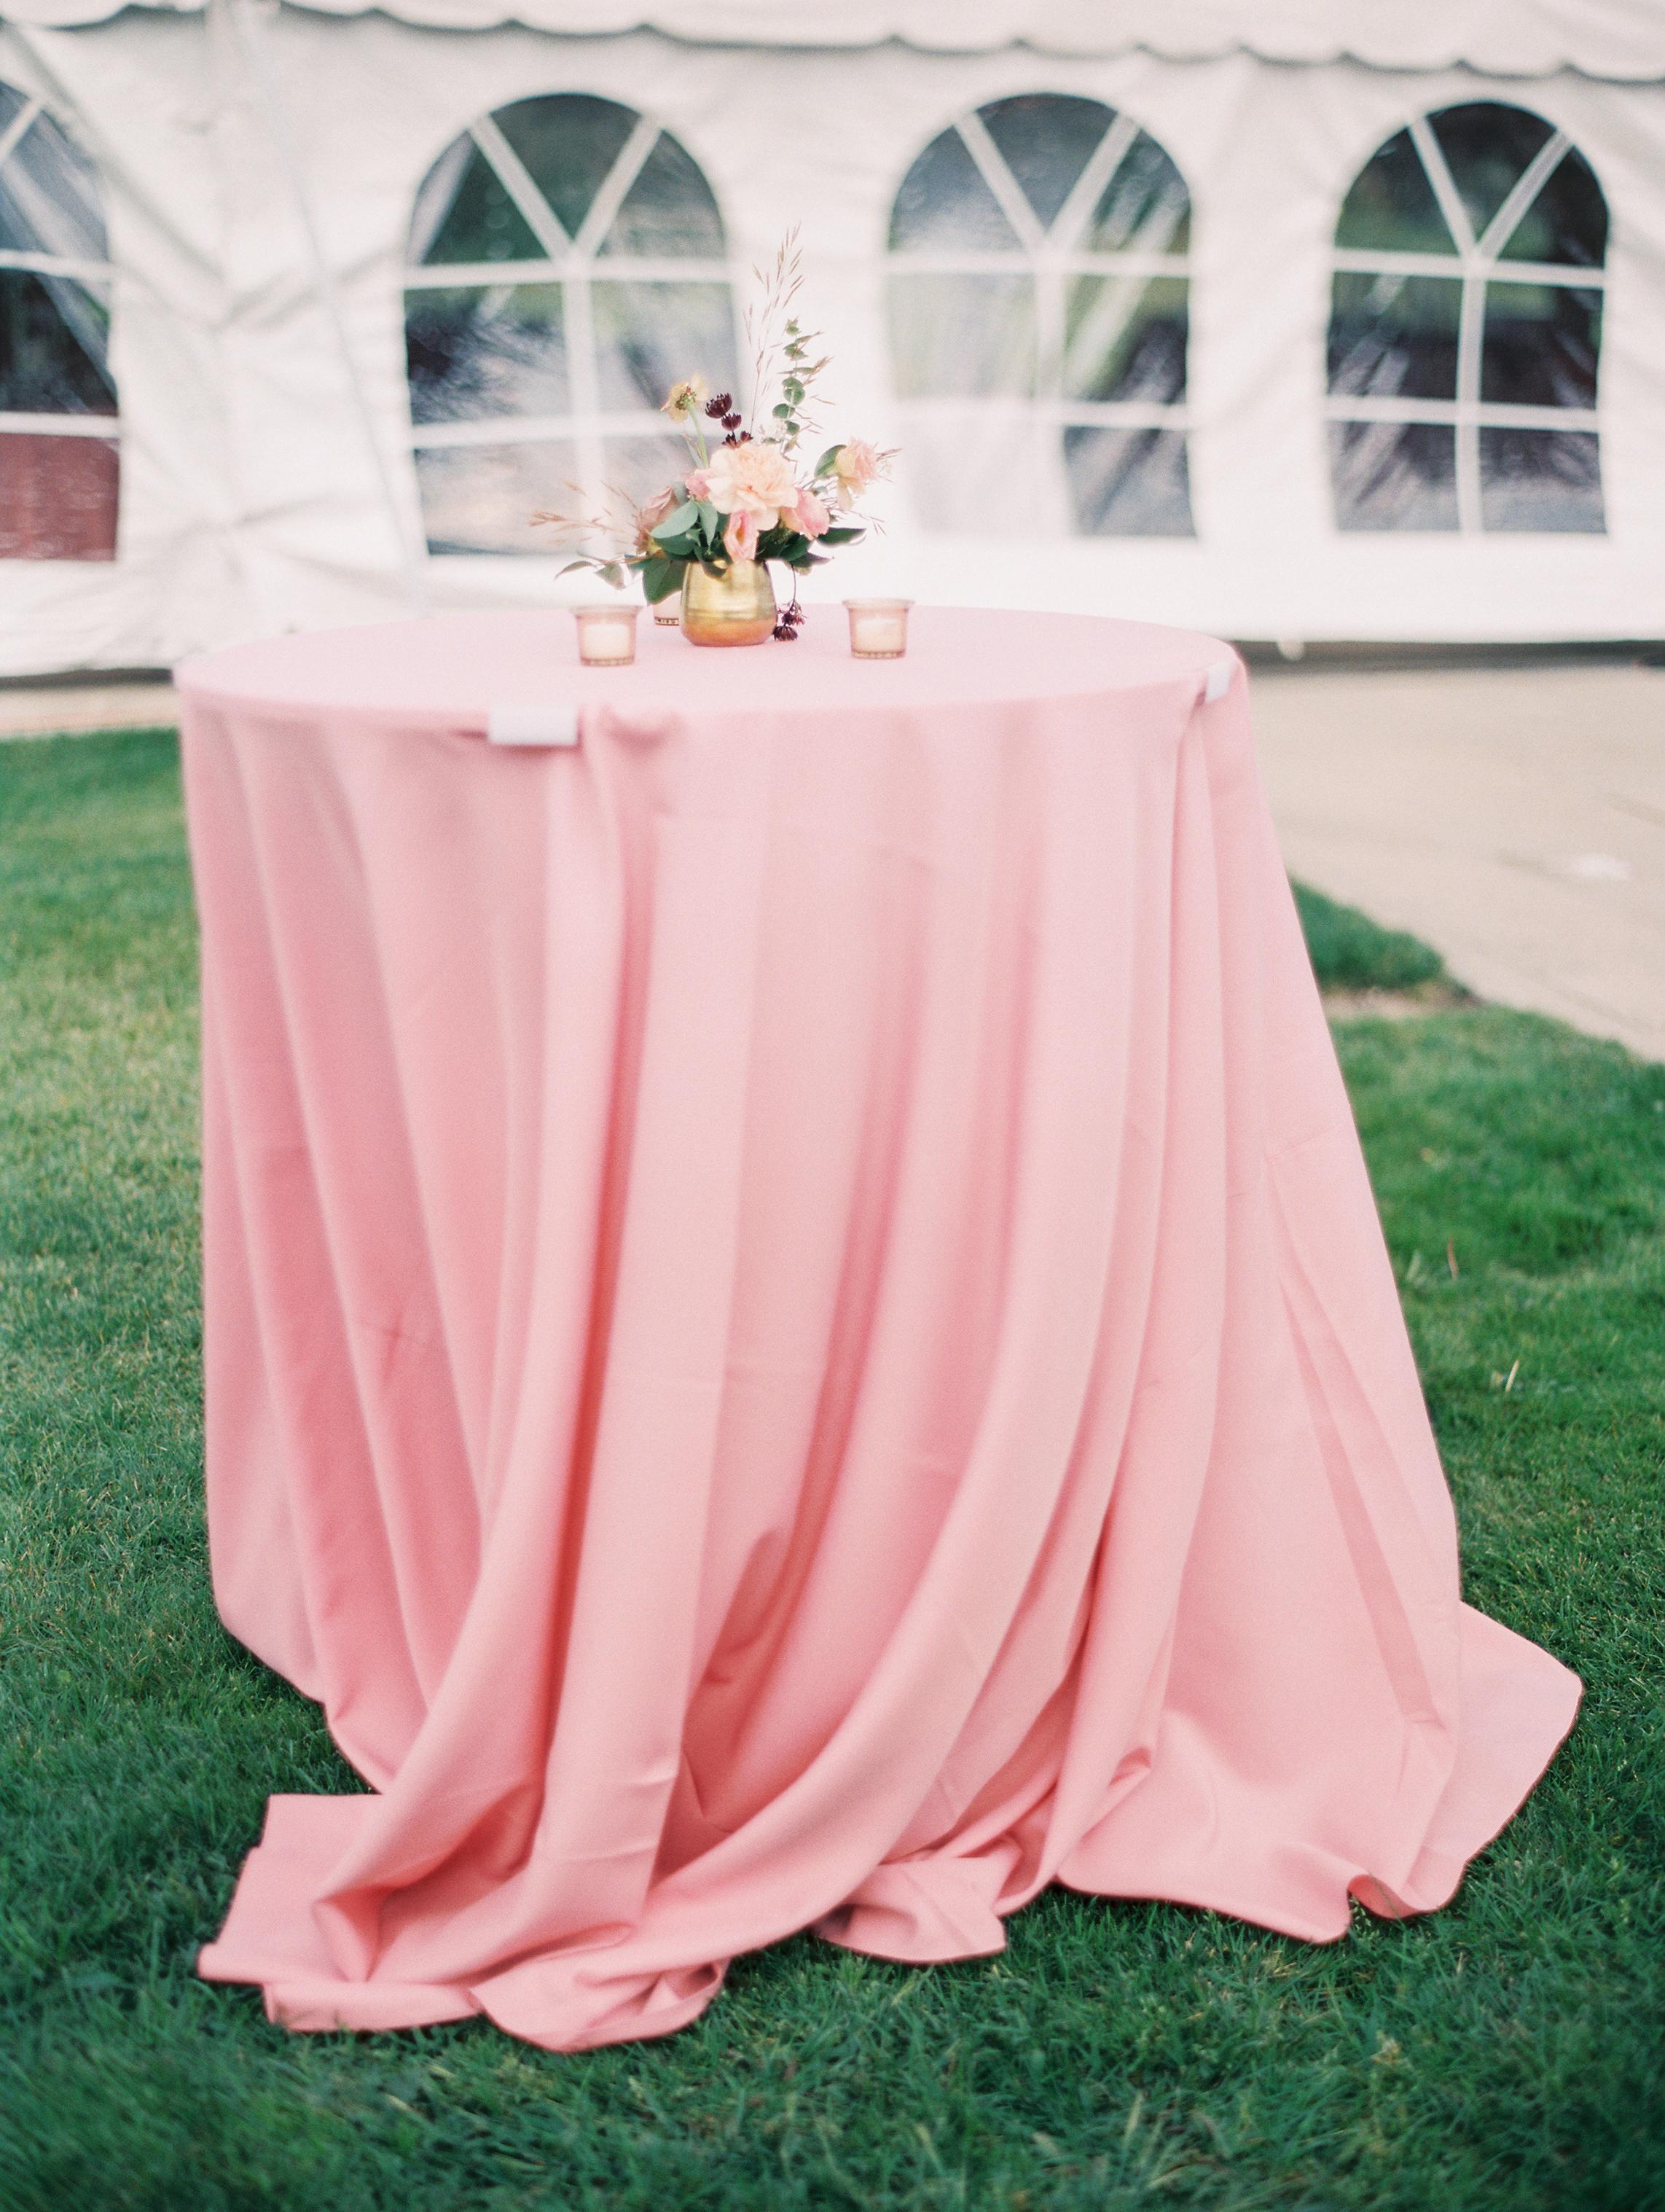 Zoller+Wedding+Reception+Detailsf-14.jpg